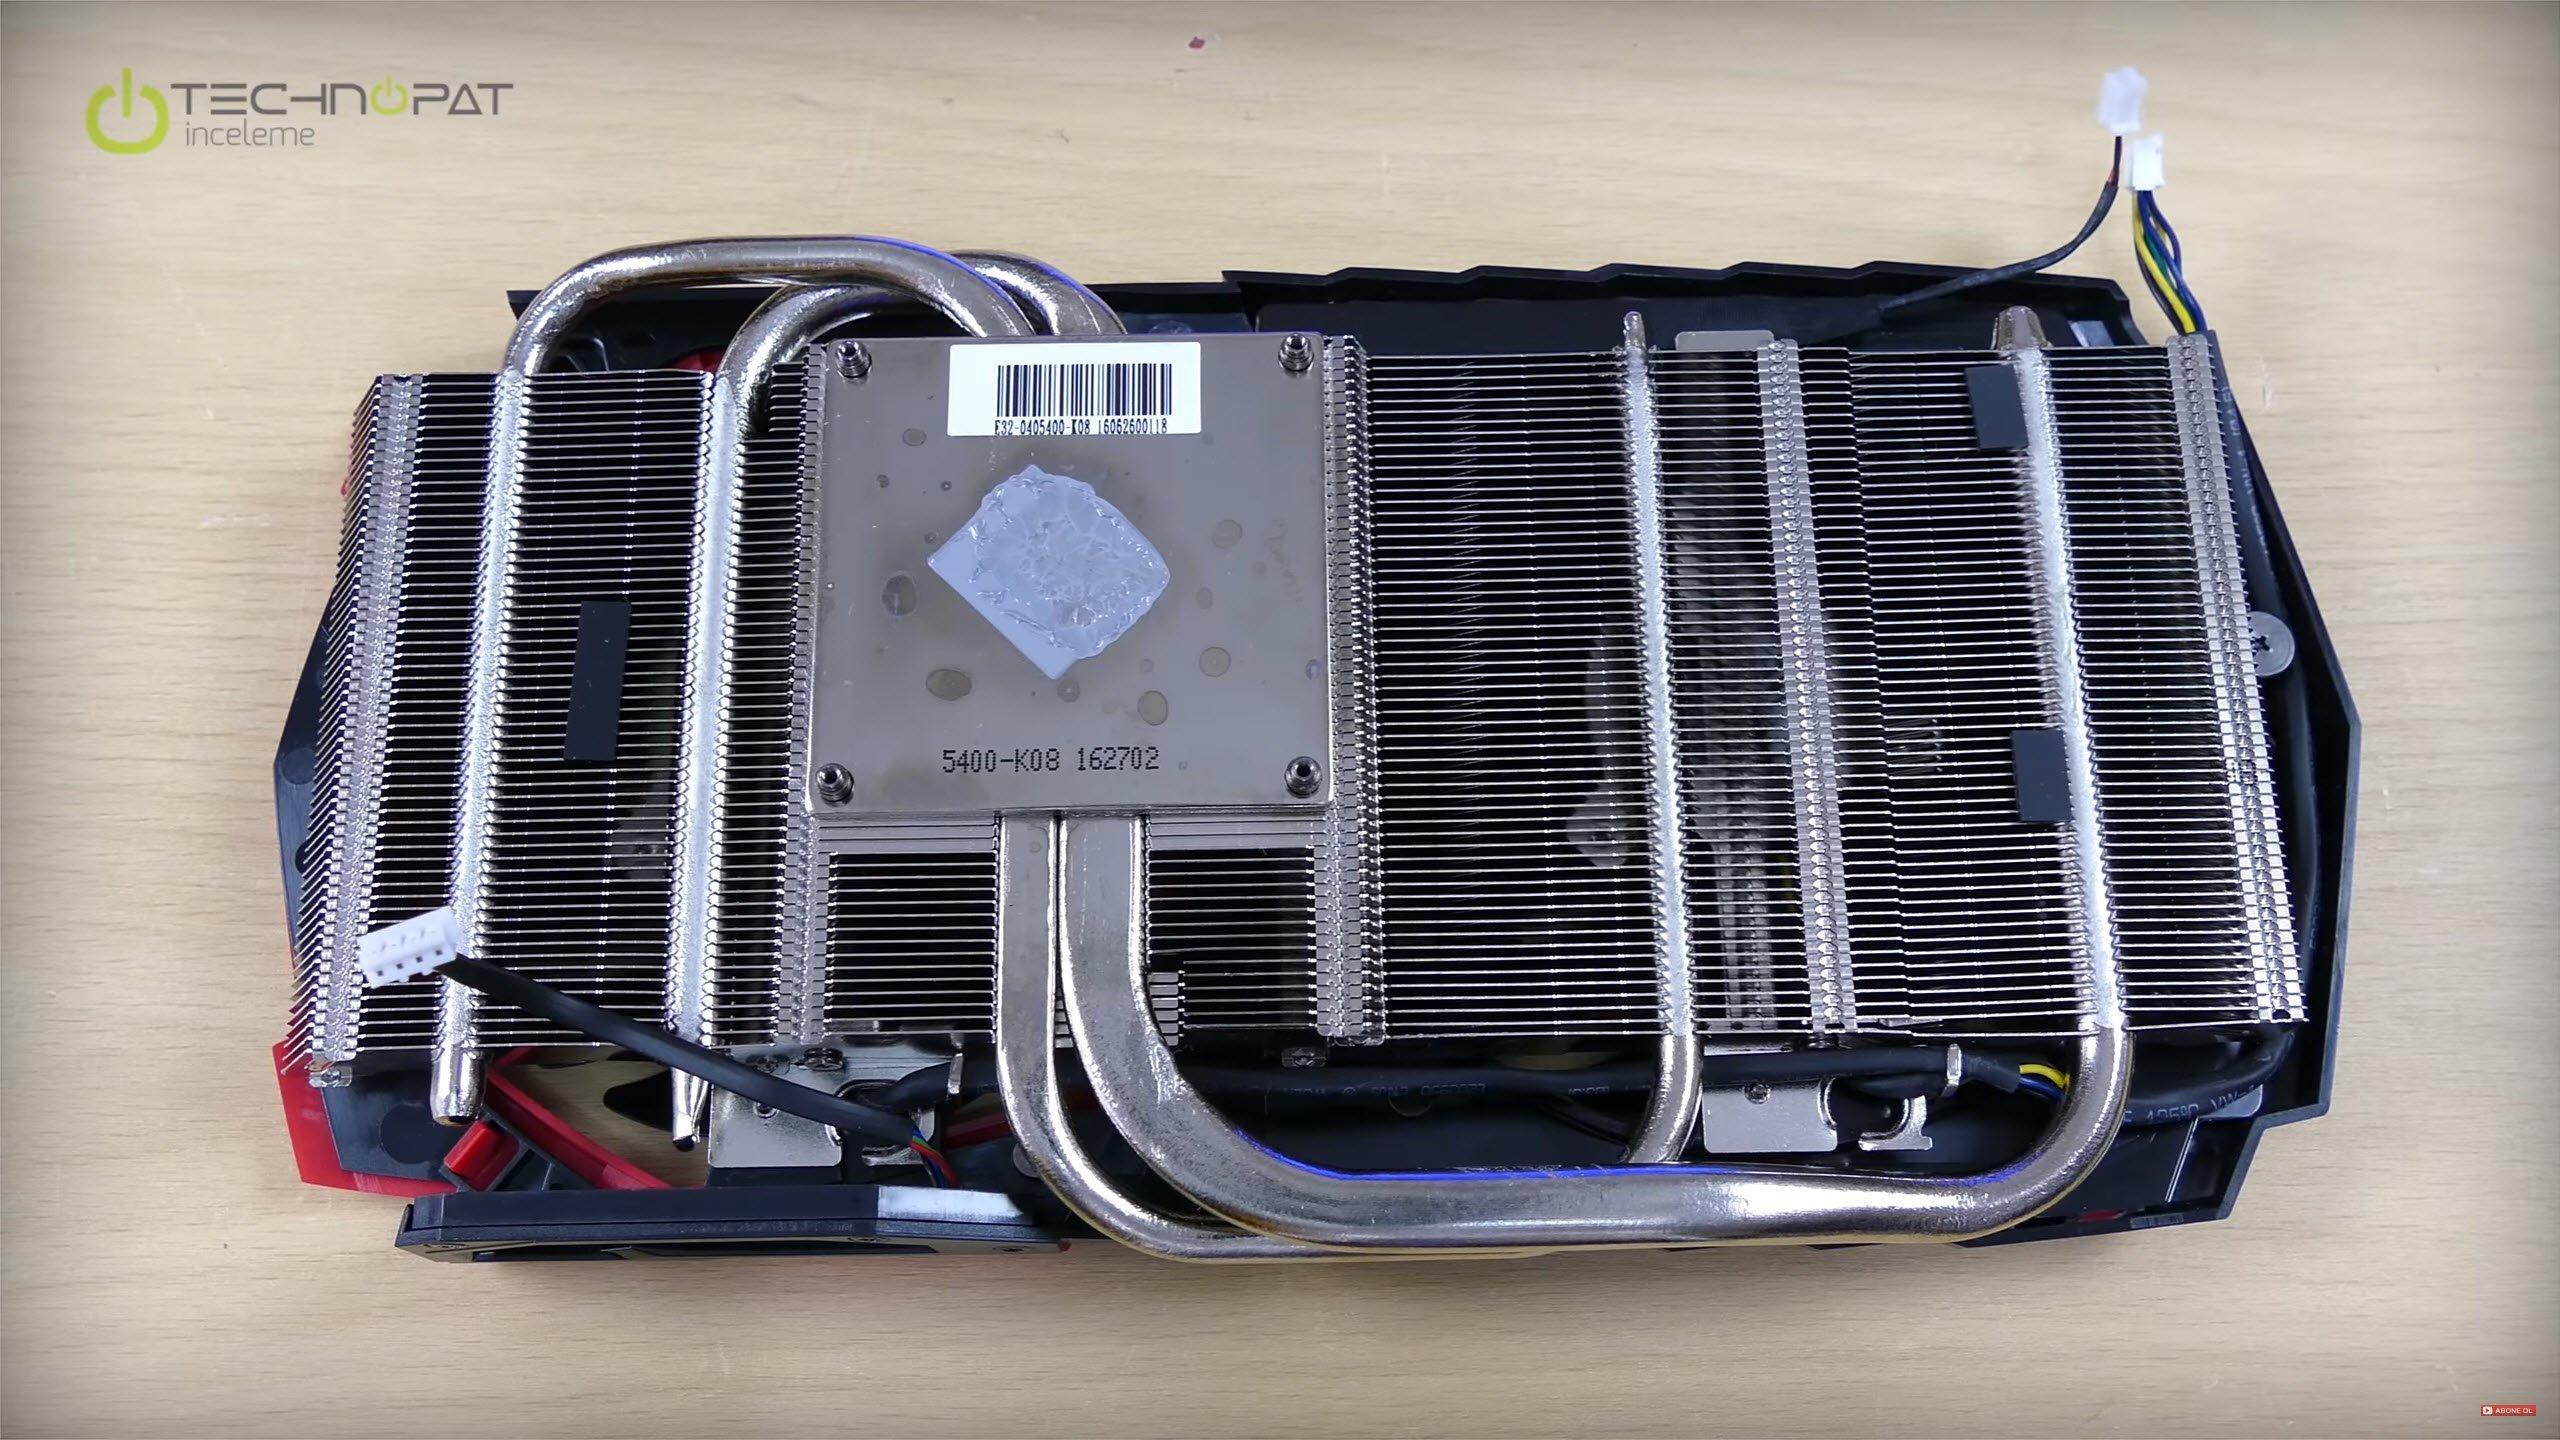 MSI RX 470 Gaming X 4G İncelemesi: Twin Frozr VI soğutma sistemi